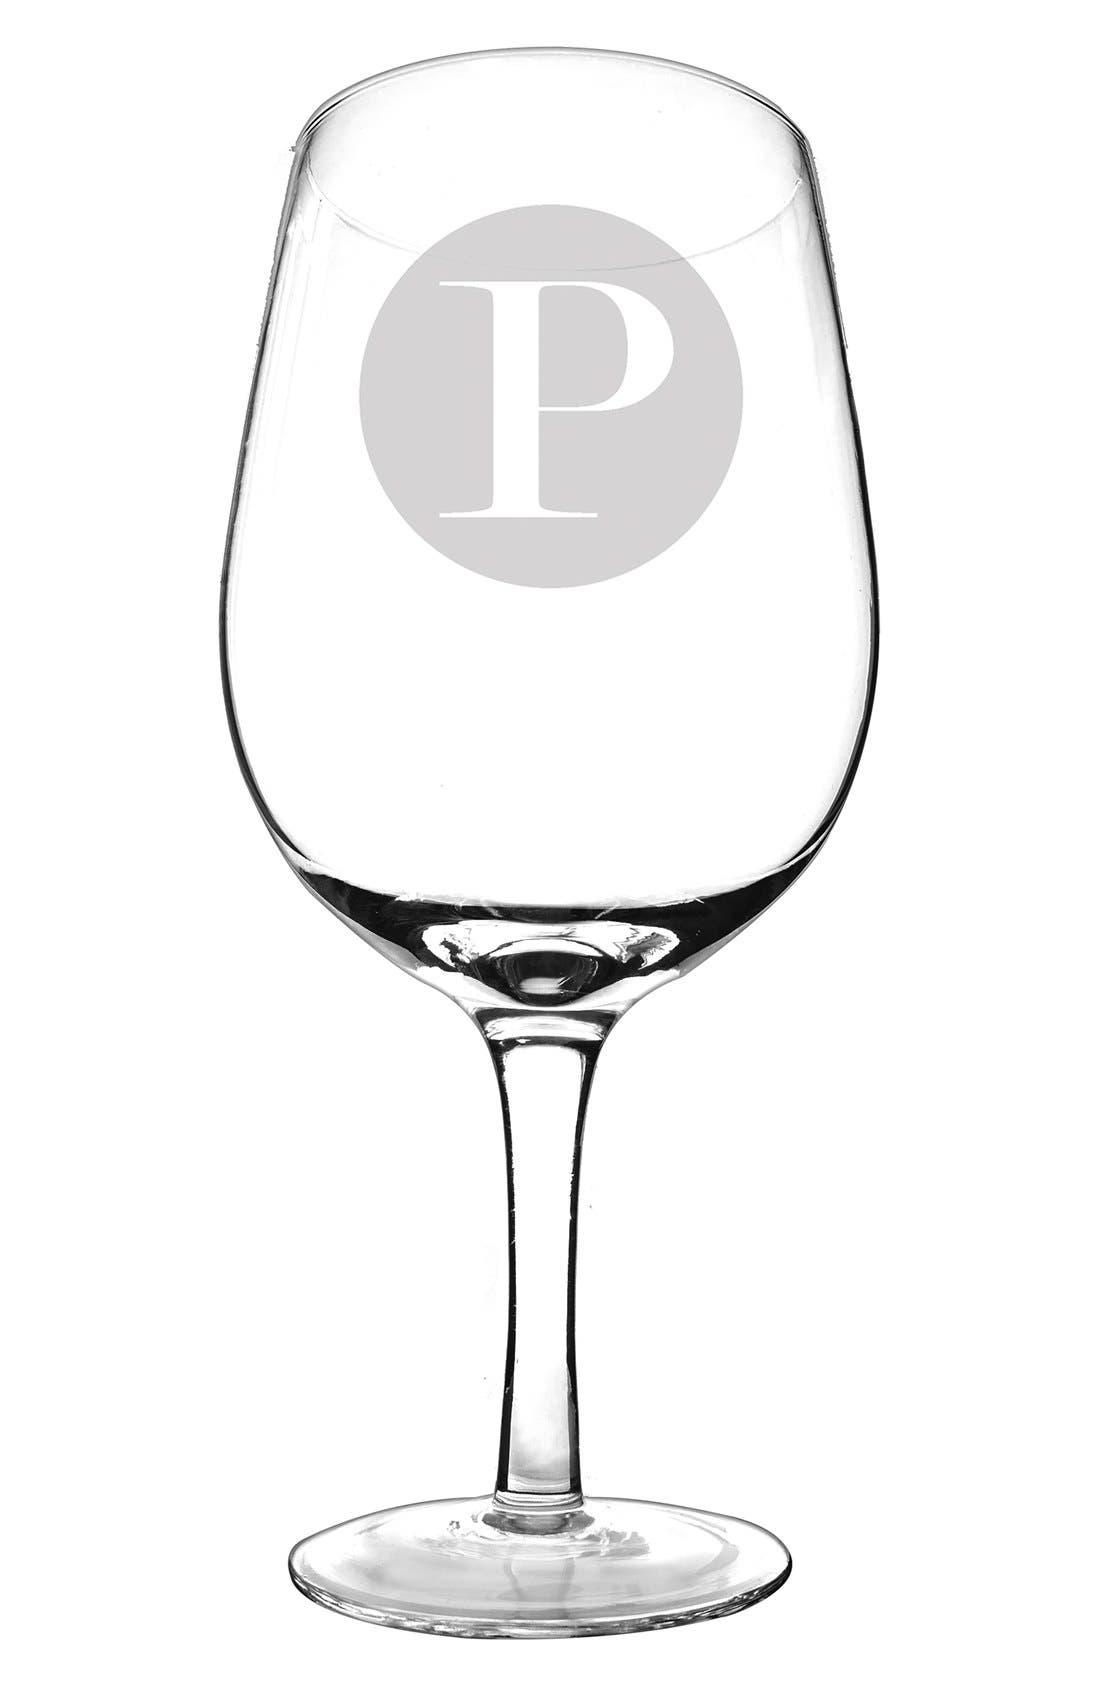 Monogram 'XL' Novelty Wine Glass,                             Main thumbnail 1, color,                             115